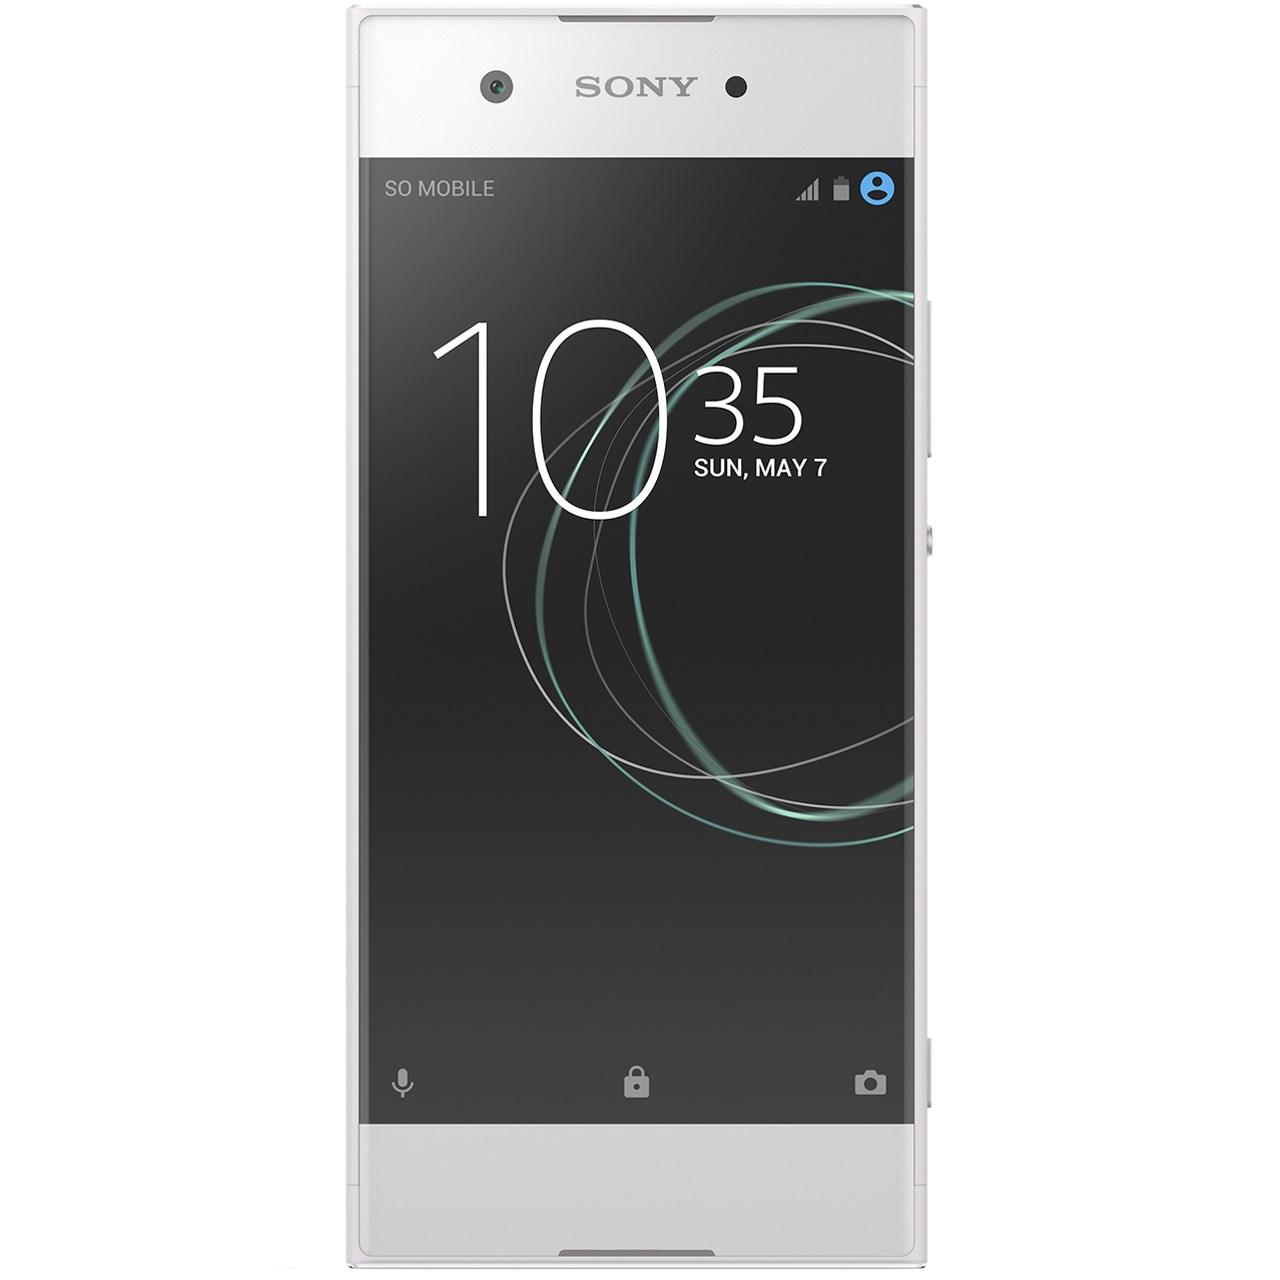 گوشی موبایل سونی مدل Xperia XA1 G3112 دو سیم کارت | Sony Xperia XA1 G3112 Dual SIM Mobile Phone